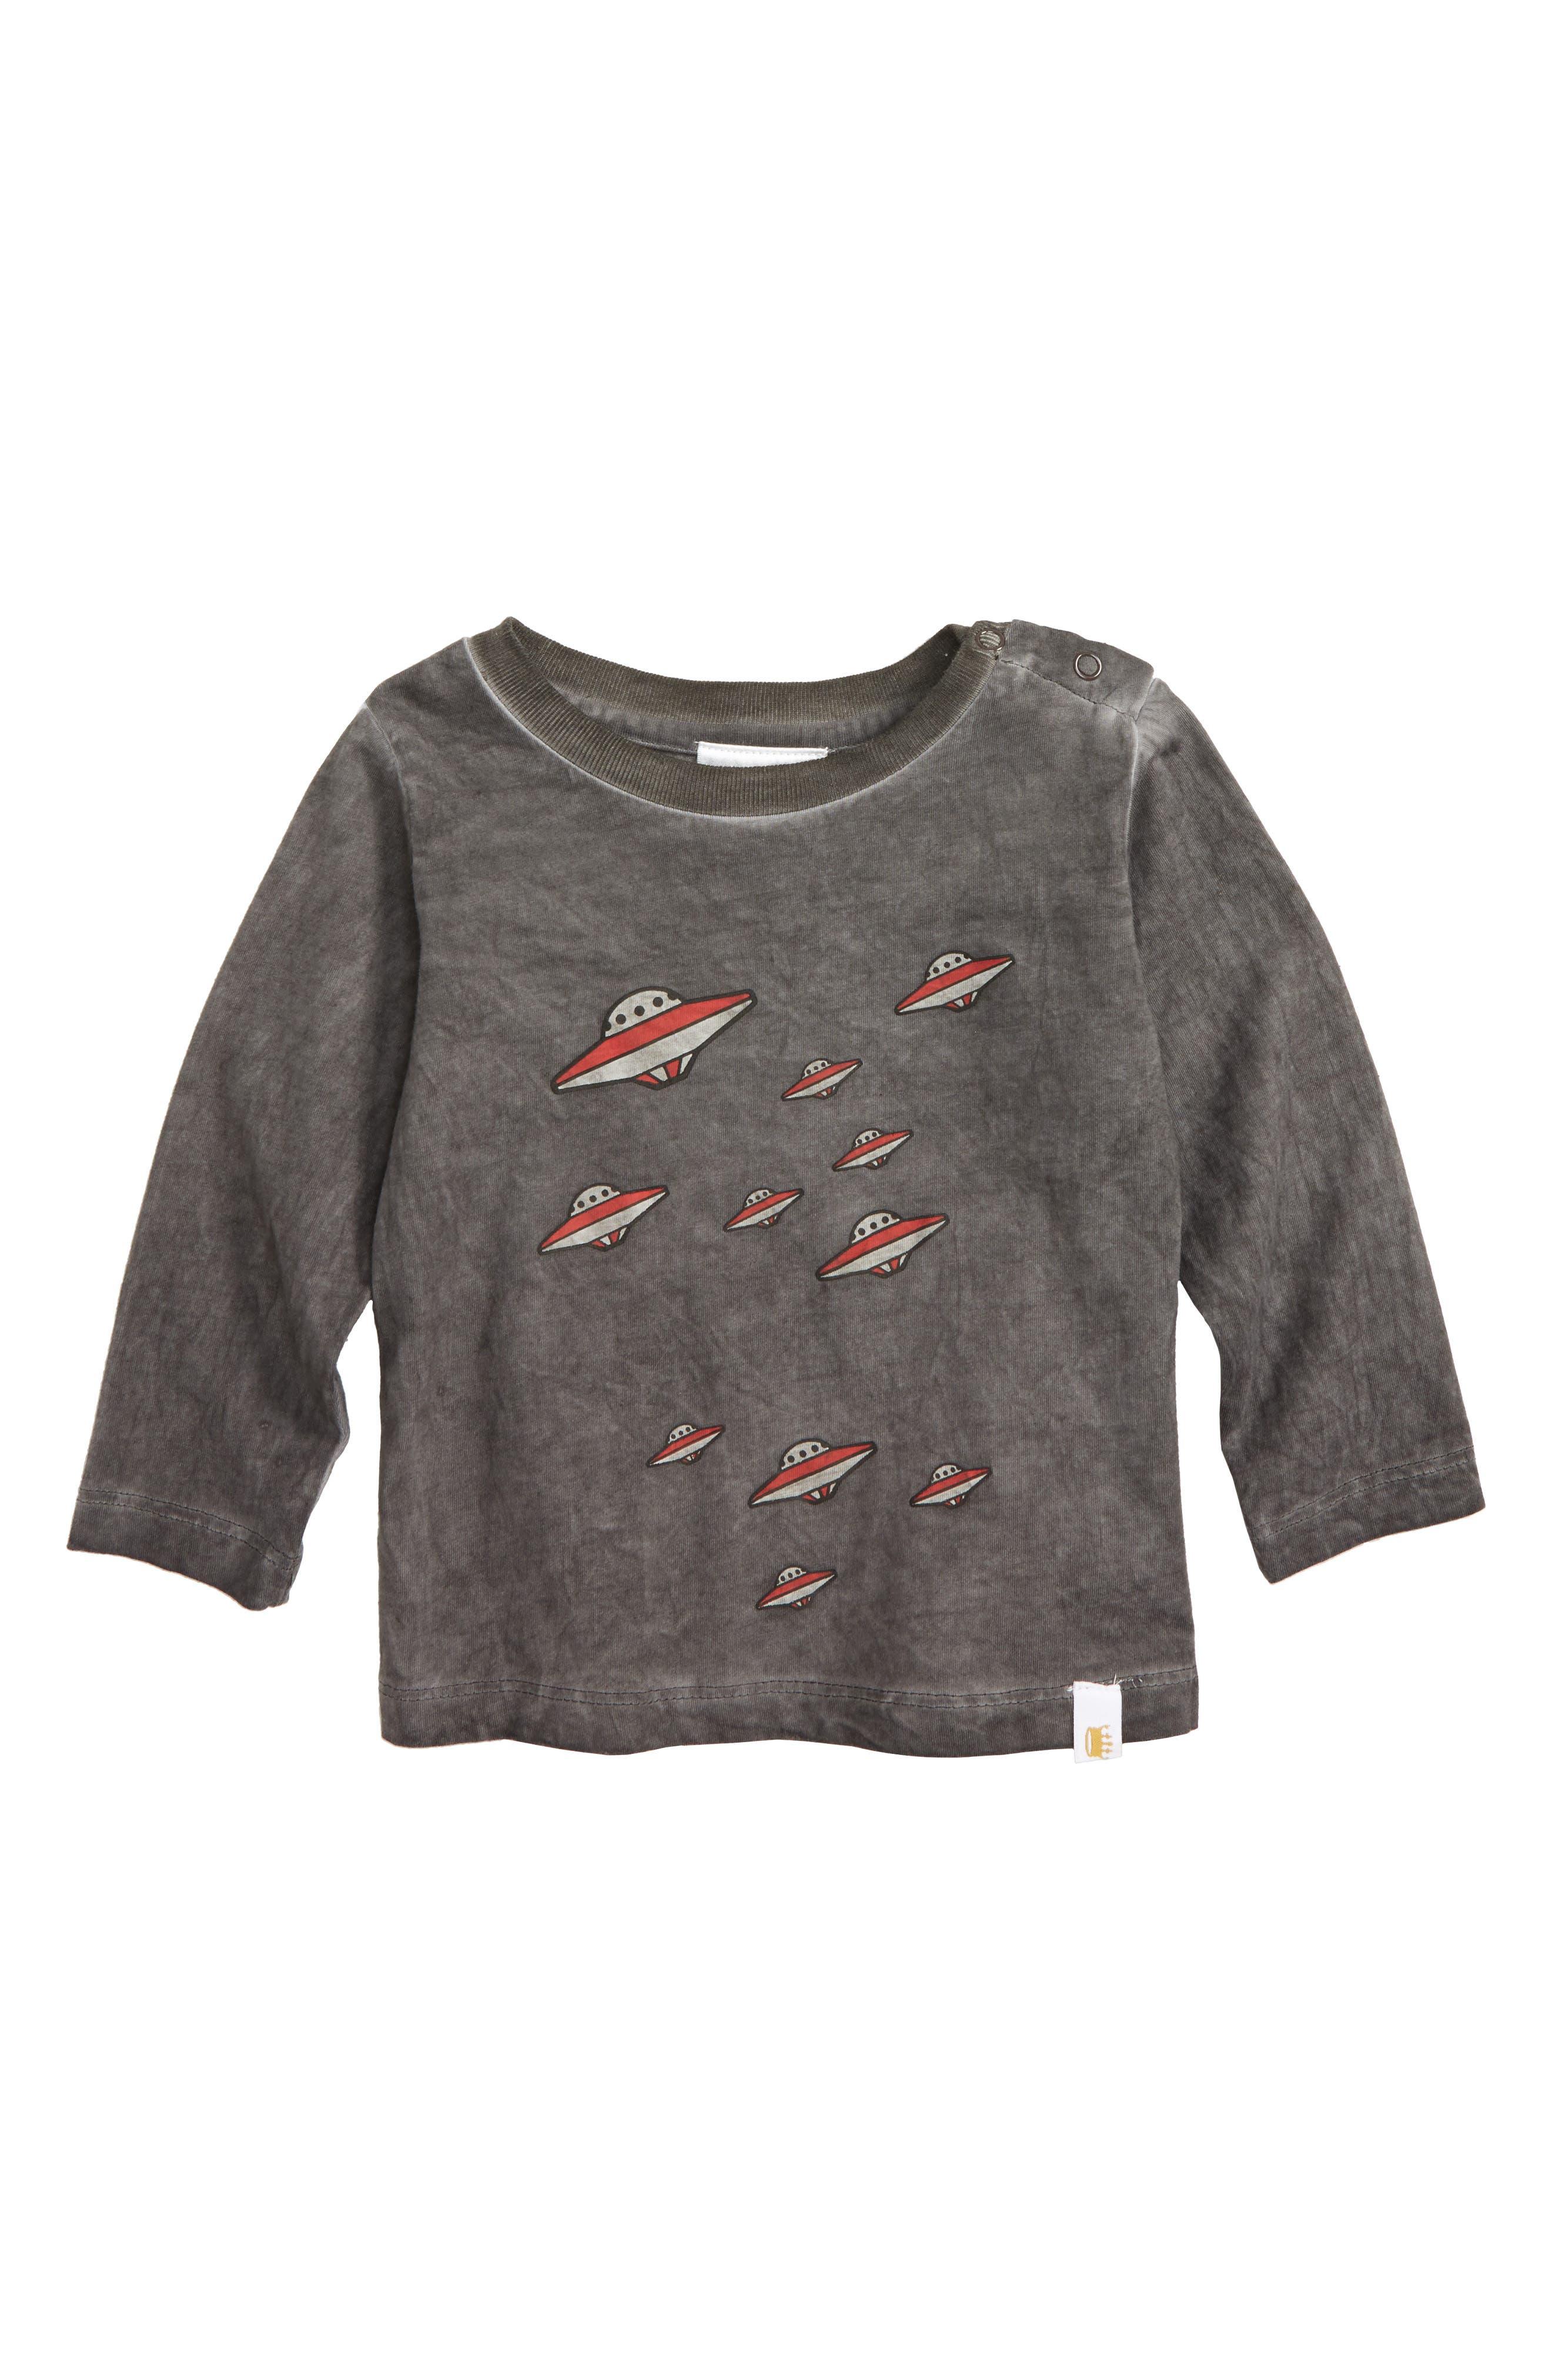 Rosie Pope UFO Graphic T-Shirt (Baby Boys)